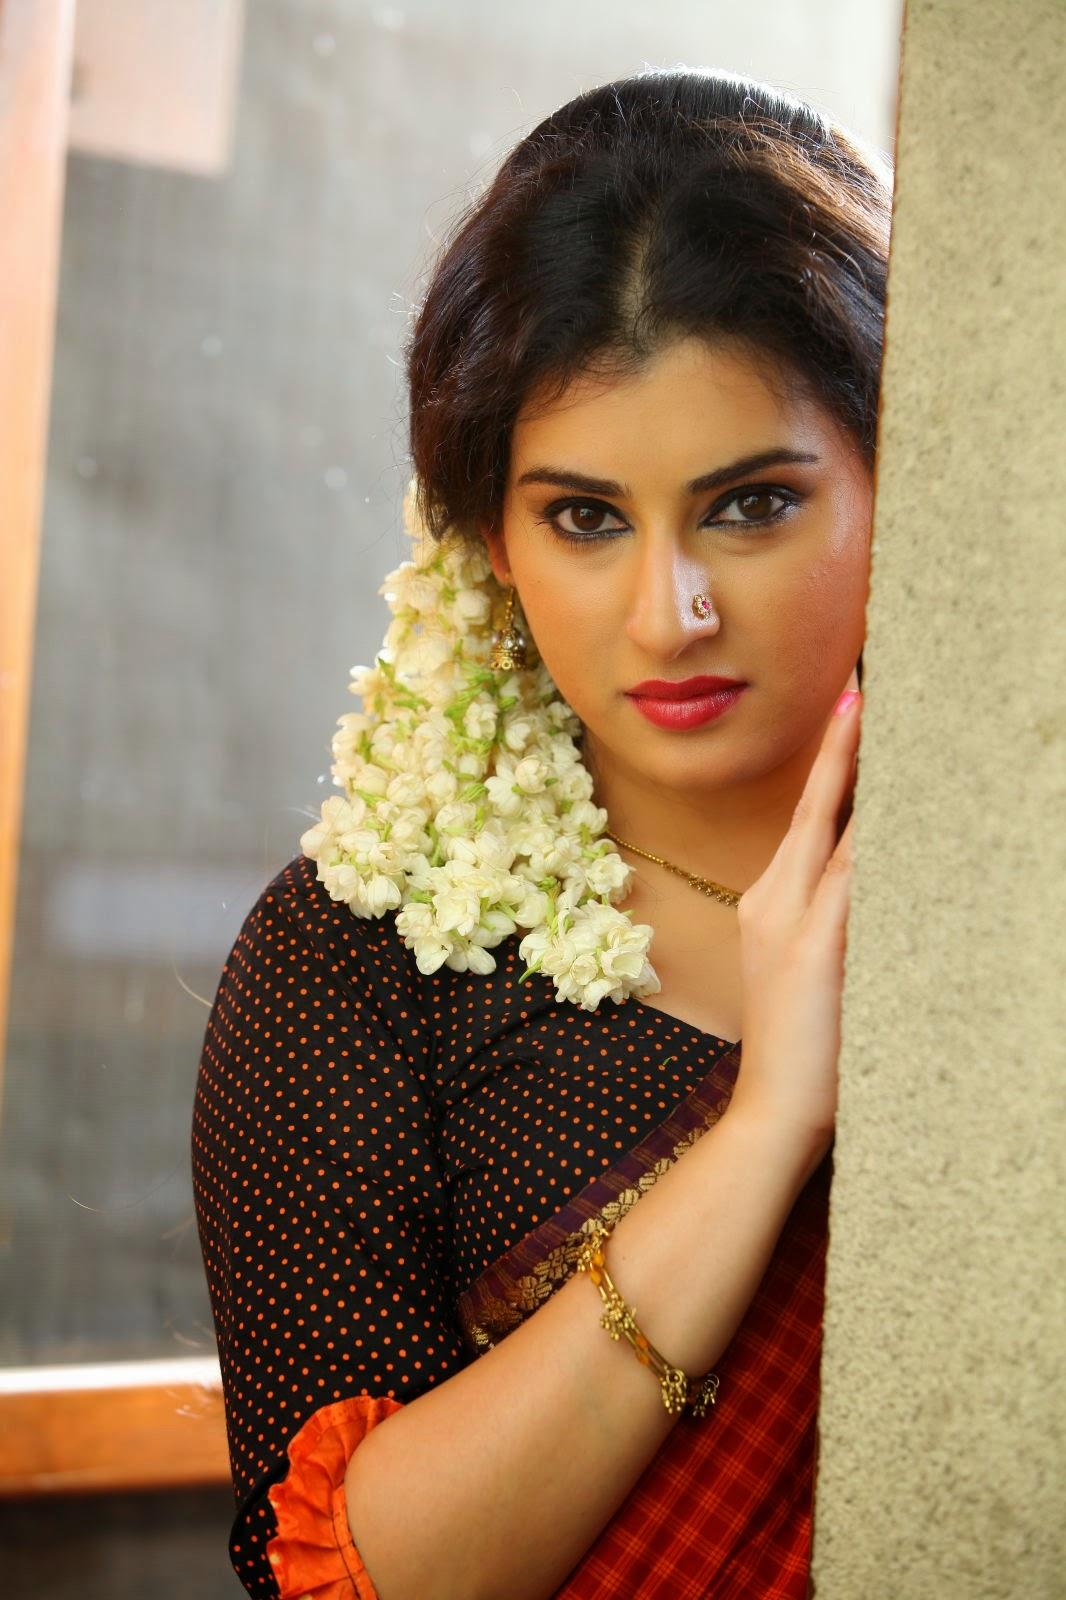 eb6f0b3fa995ba Actress veda hot stills - Bherunda pakshiya movie